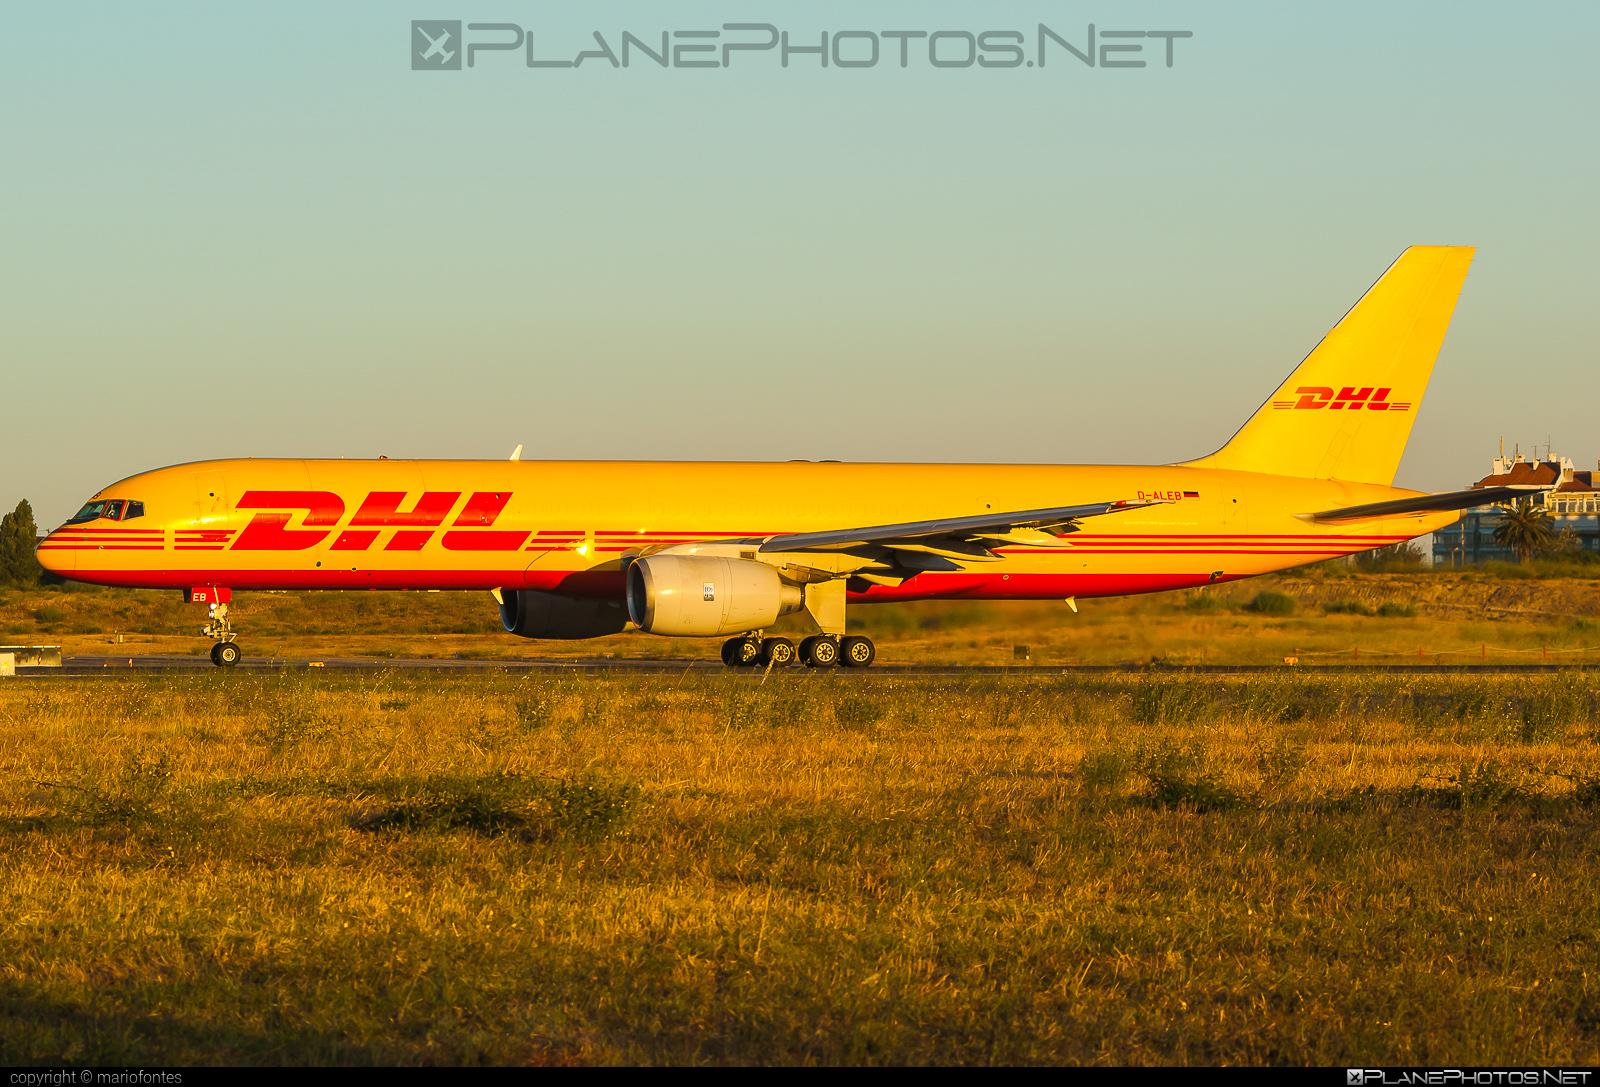 Boeing 757-200SF - D-ALEB operated by DHL (European Air Transport) #b757 #boeing #boeing757